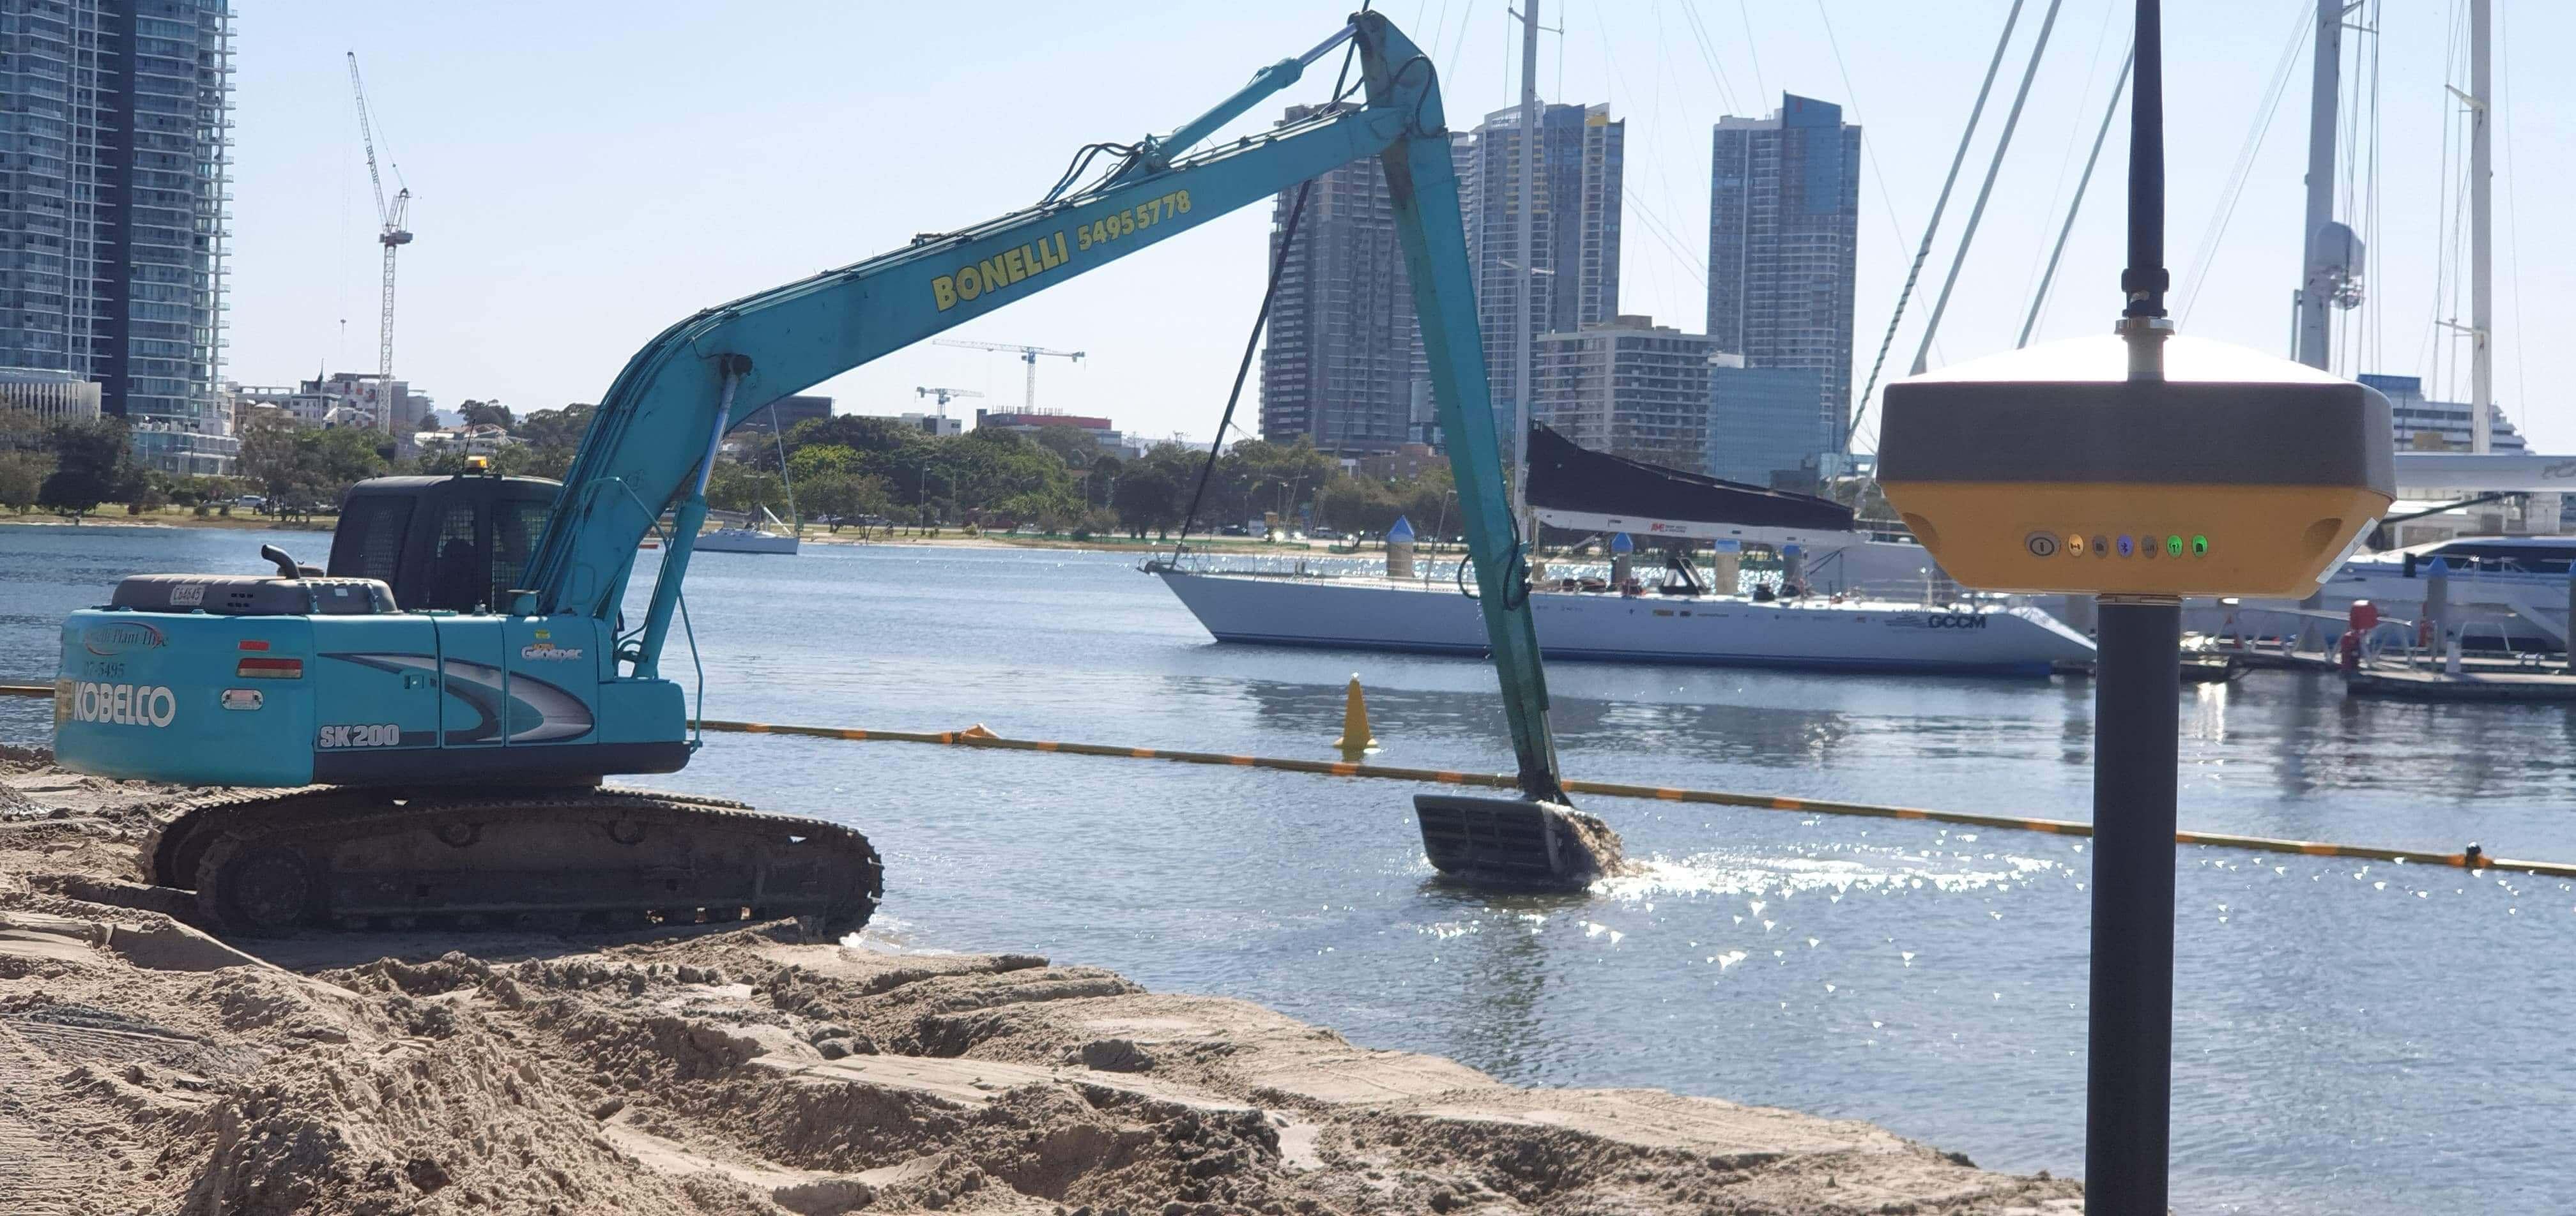 Sheroz-Earthworks-excavator-kobelco-service-ute-topcon gps for sale asutralia-topcon gx60-topcon gps excavator-topcon 2d